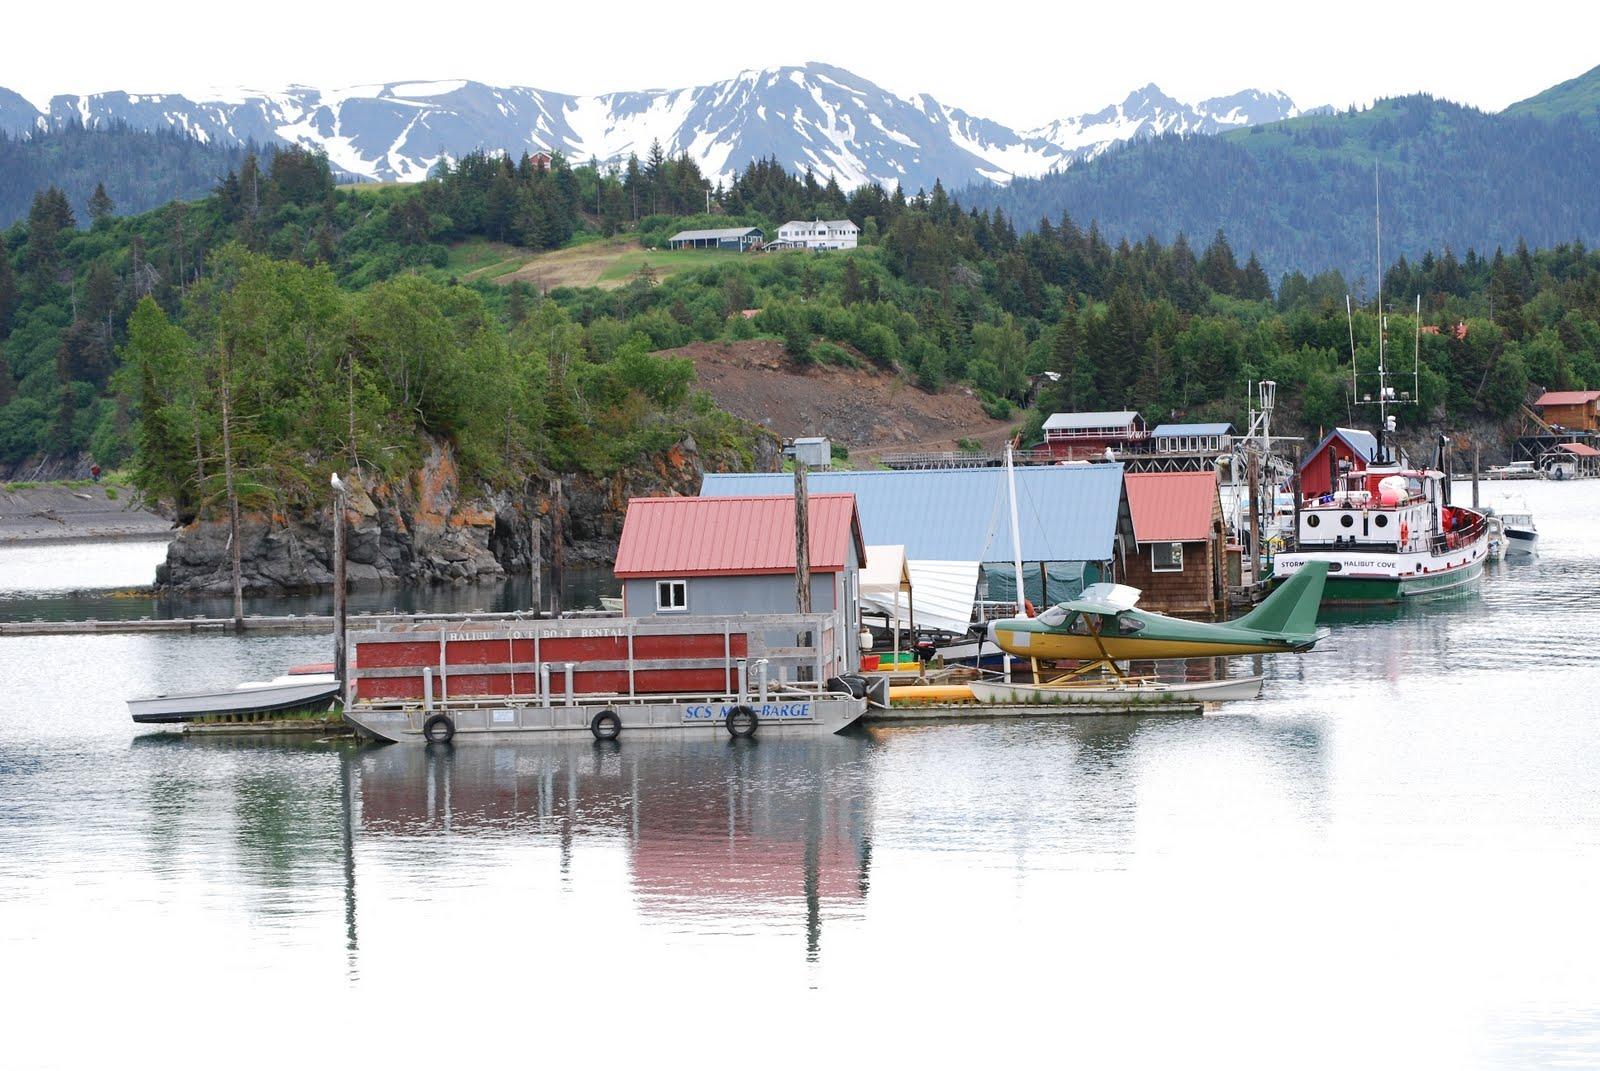 Travel Alaska  Halibut Cove Traveler and Vacation Information